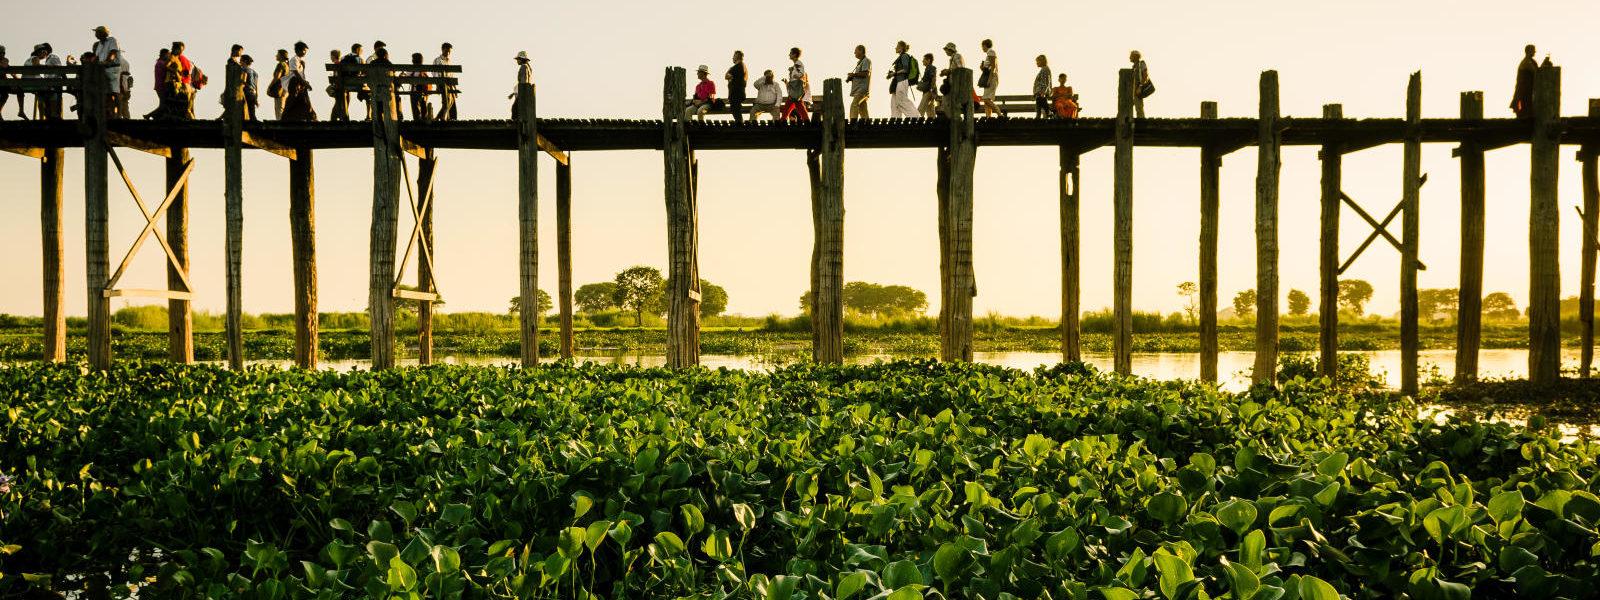 Myanmar Crown Tour - U Bein Bridge - Amarapura - Sampan Travel